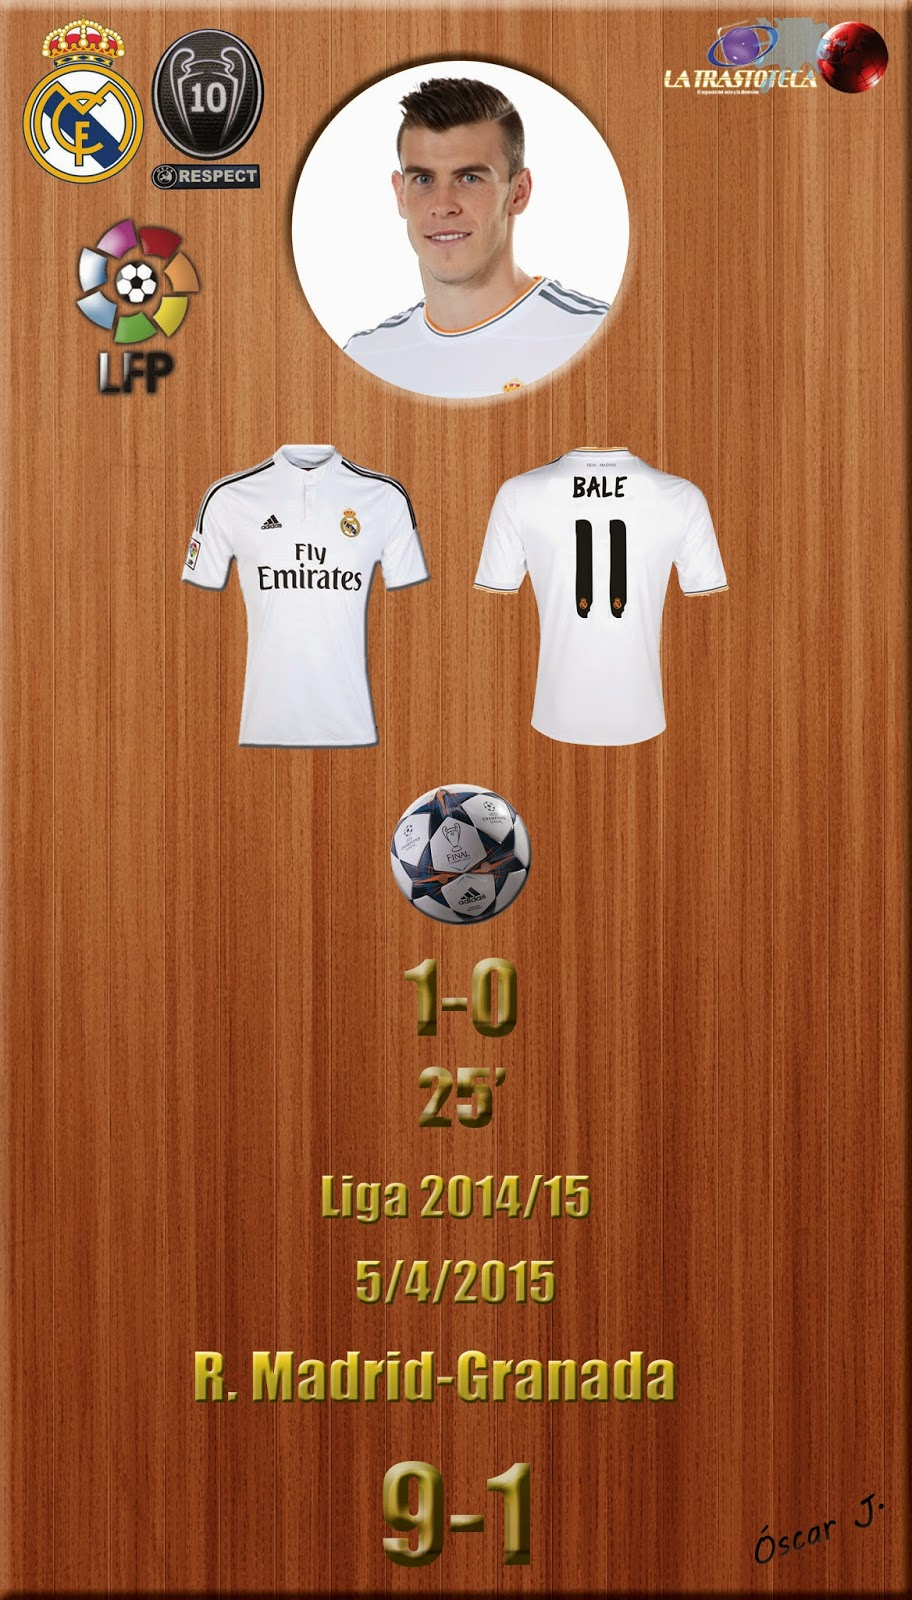 Gareth Bale (1-0) - Real Madrid 9-1 Granada - Liga 2014/15 - Jornada 29 - (5/4/2015)